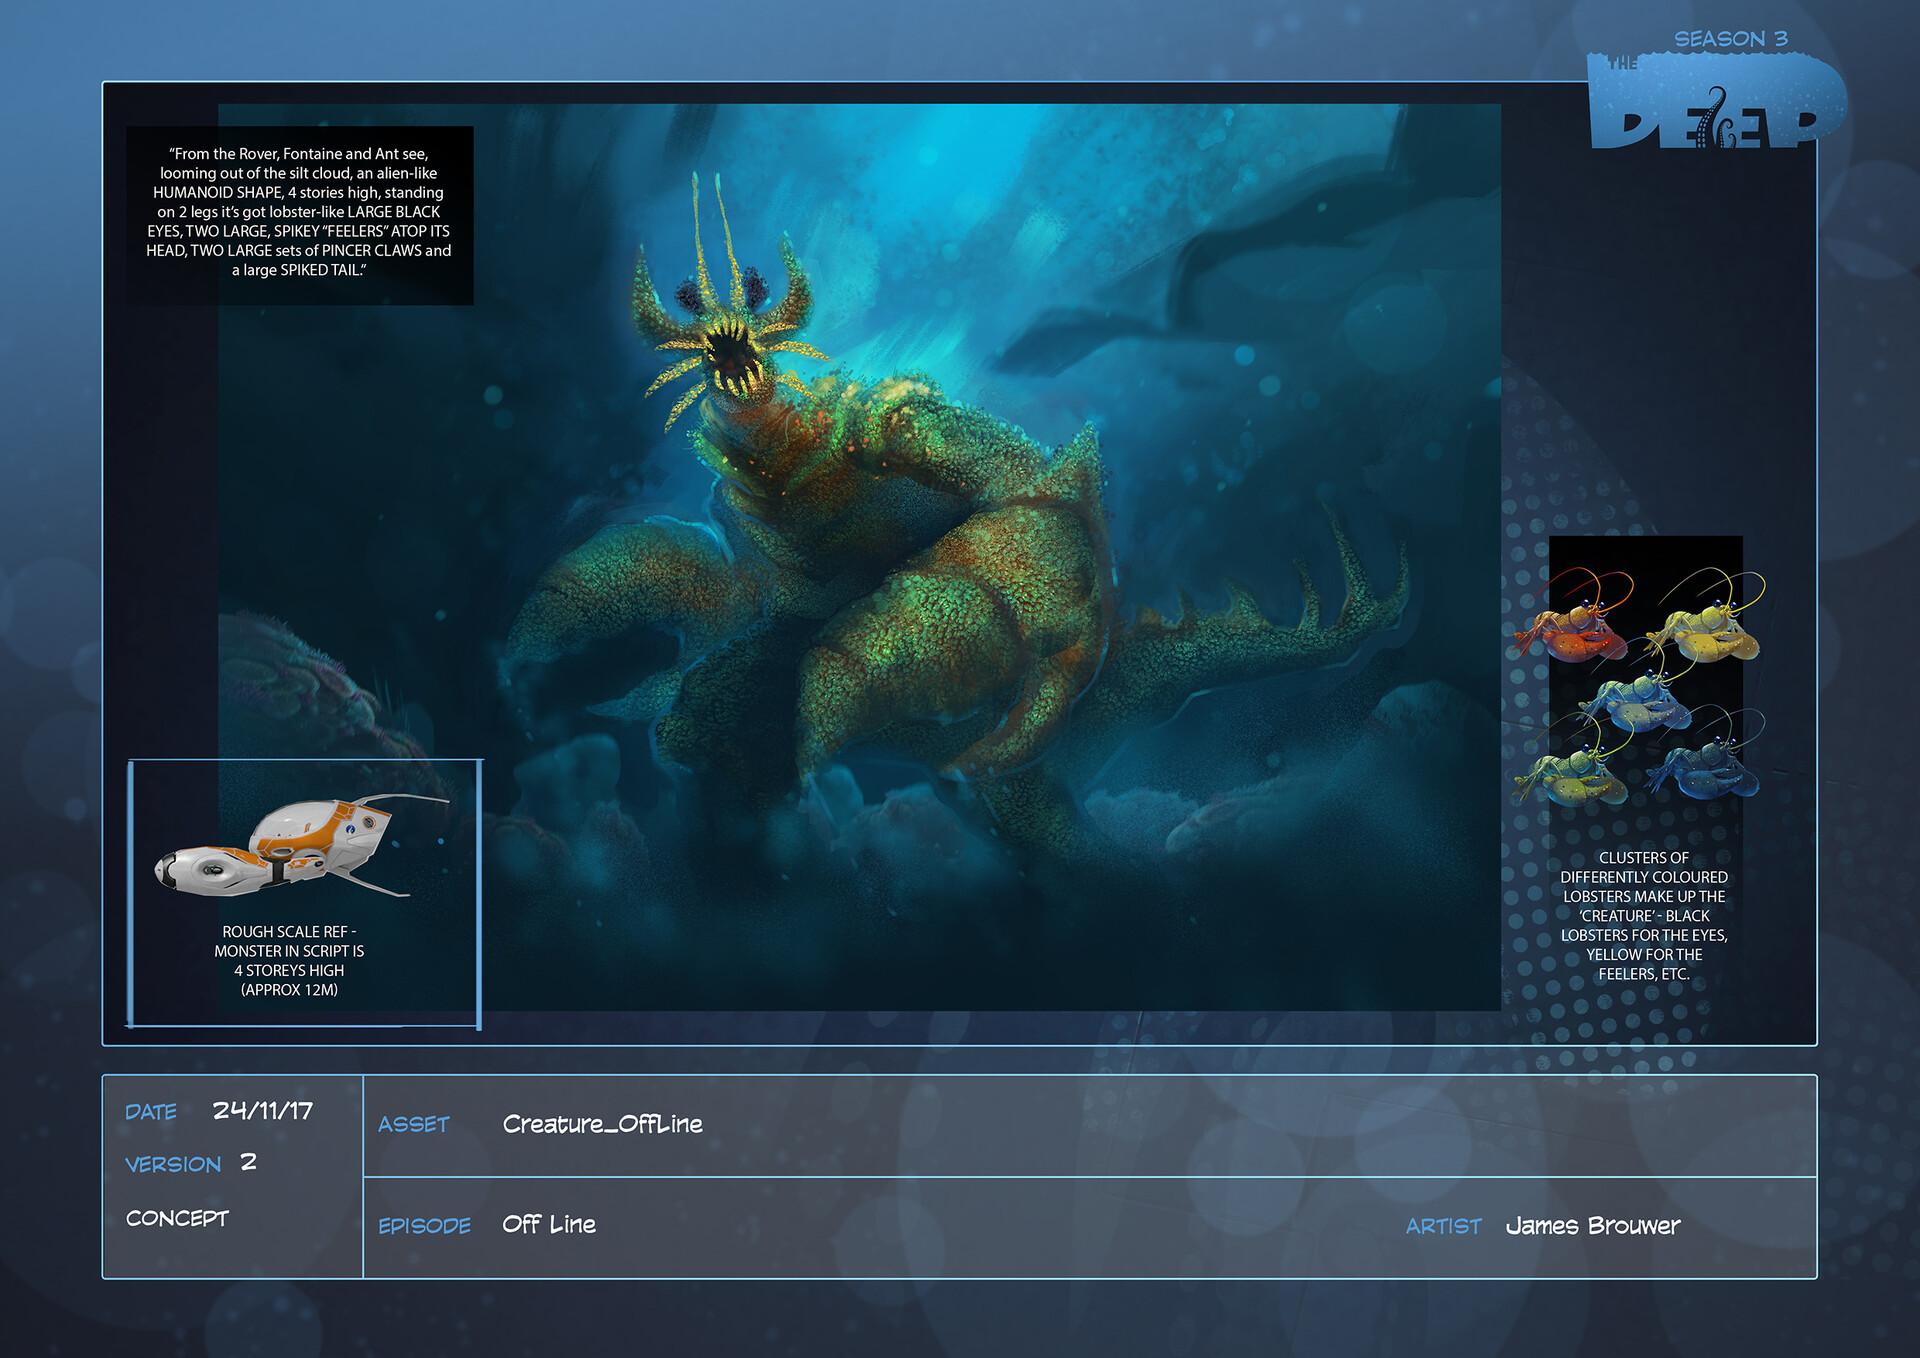 James brouwer creature offline design v002